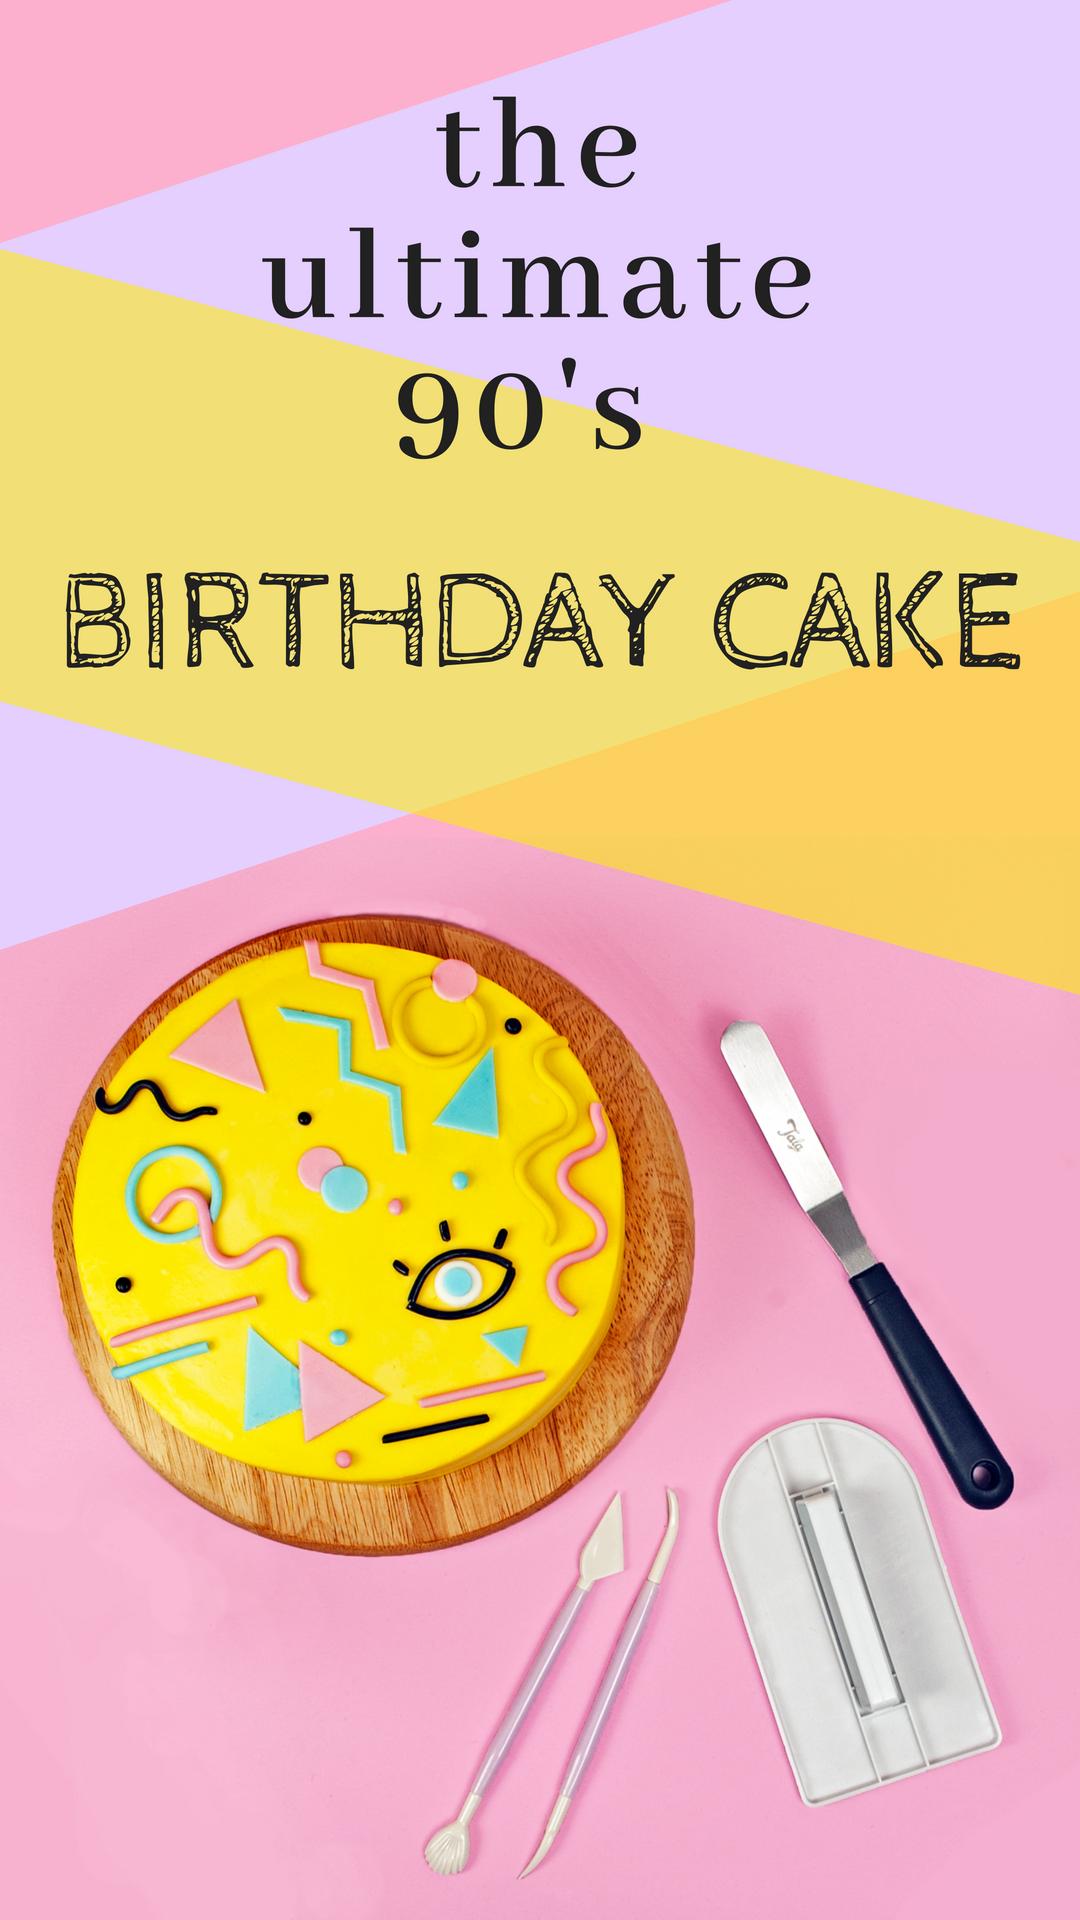 the ultimate 90's birthday cake DIY, very beginner friendly.png